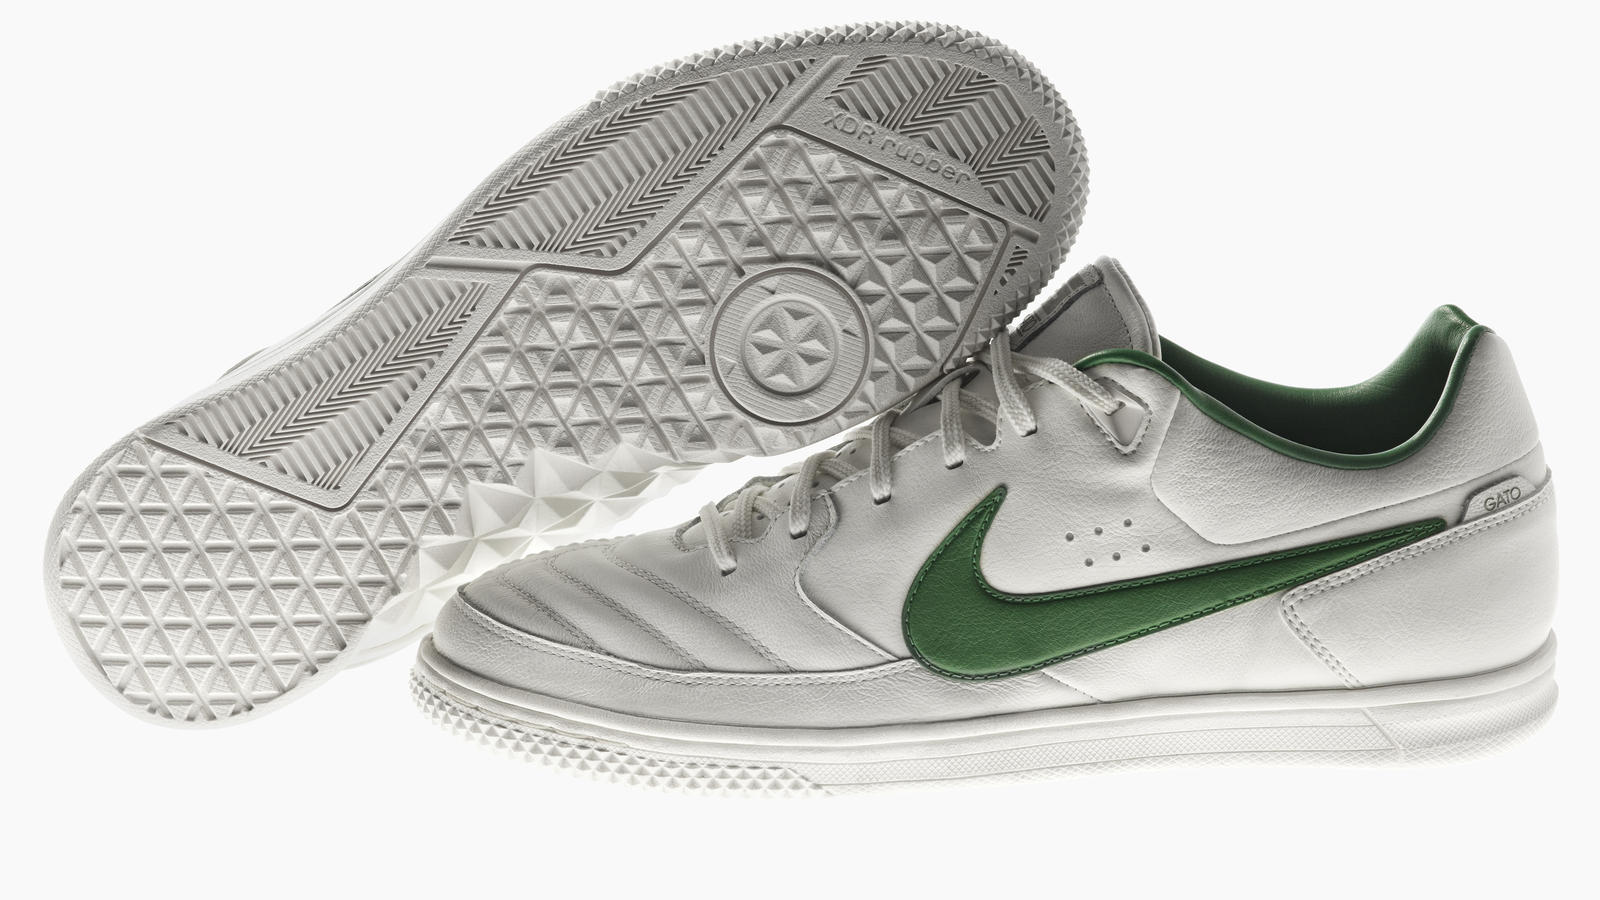 Nike Introduces the Nike5 Gato Street